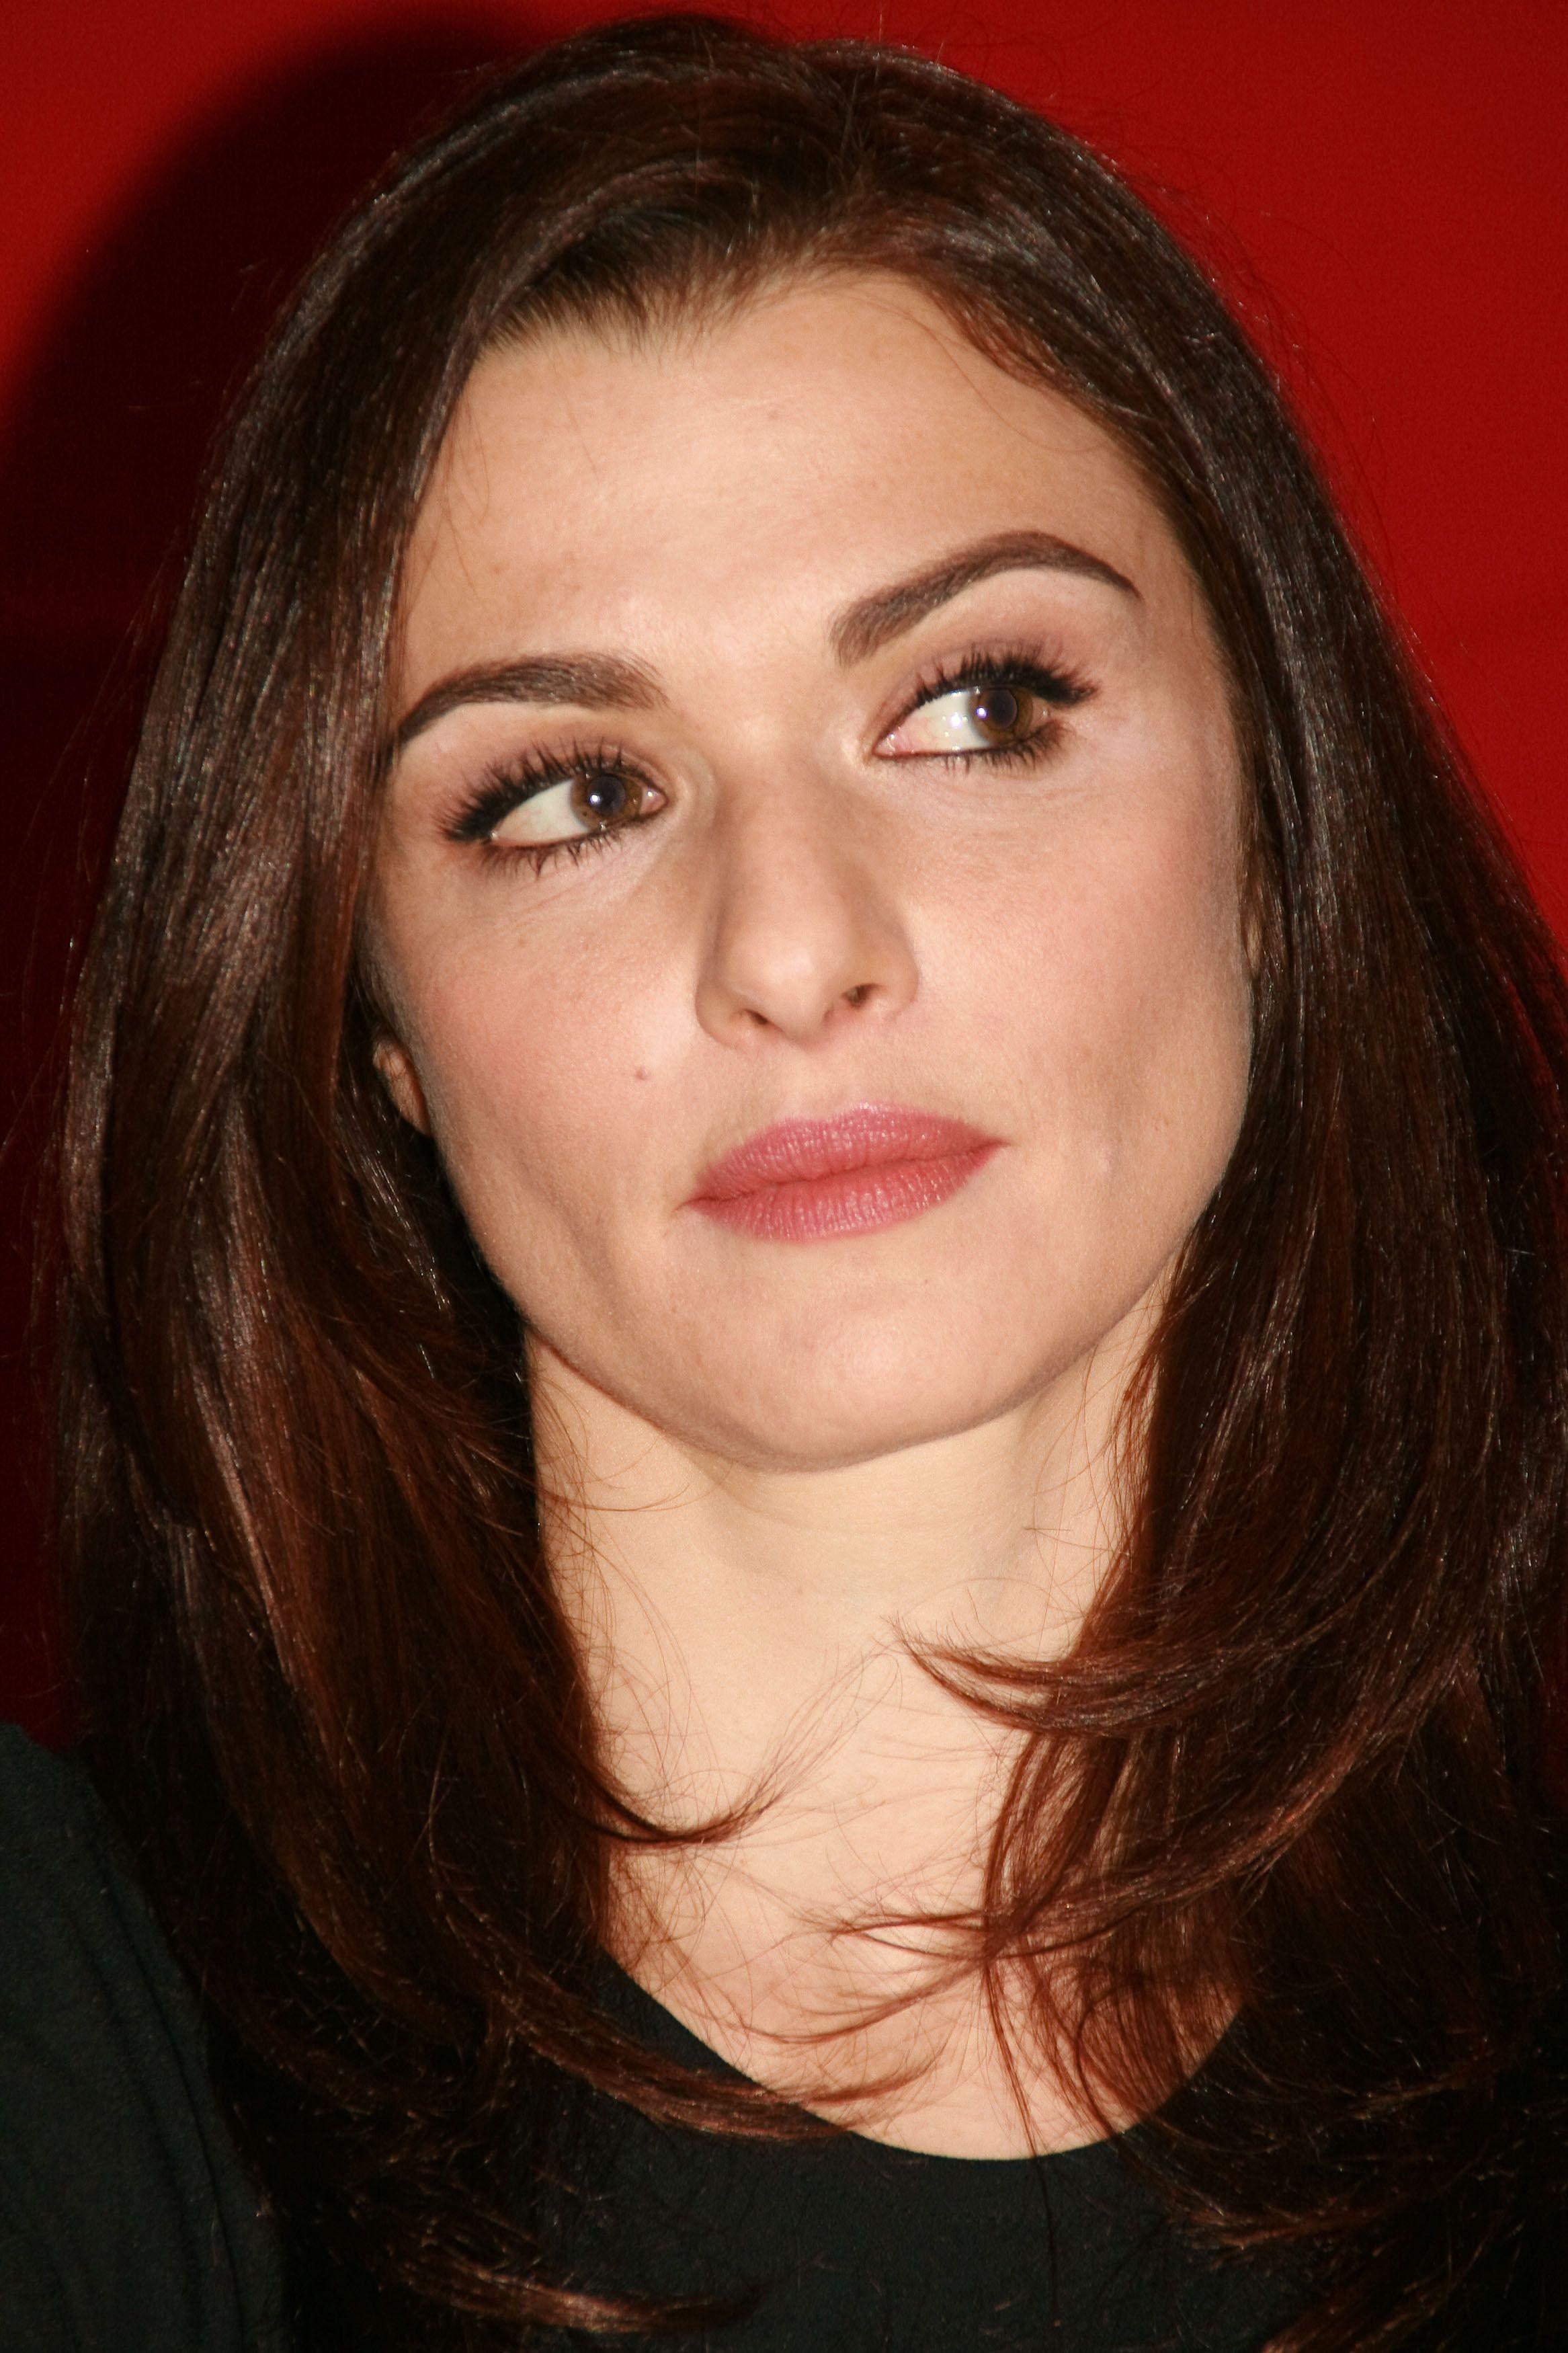 Rachel Weisz Curved eyebrows, Thick eyebrows, Eyebrow